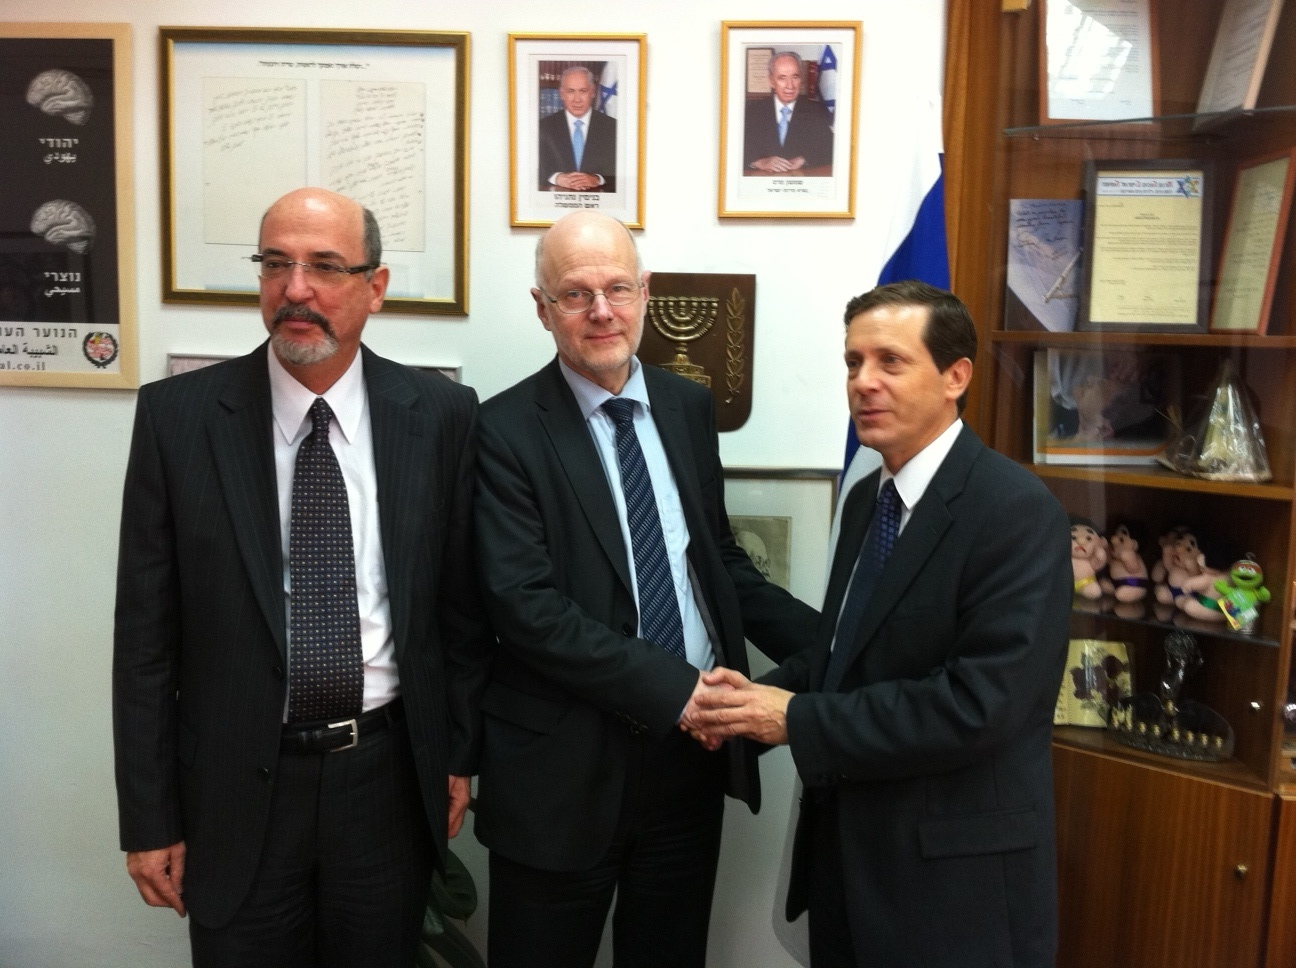 From left: Yehuda Talmon, Staffan Nilsson, Isaac Herzog